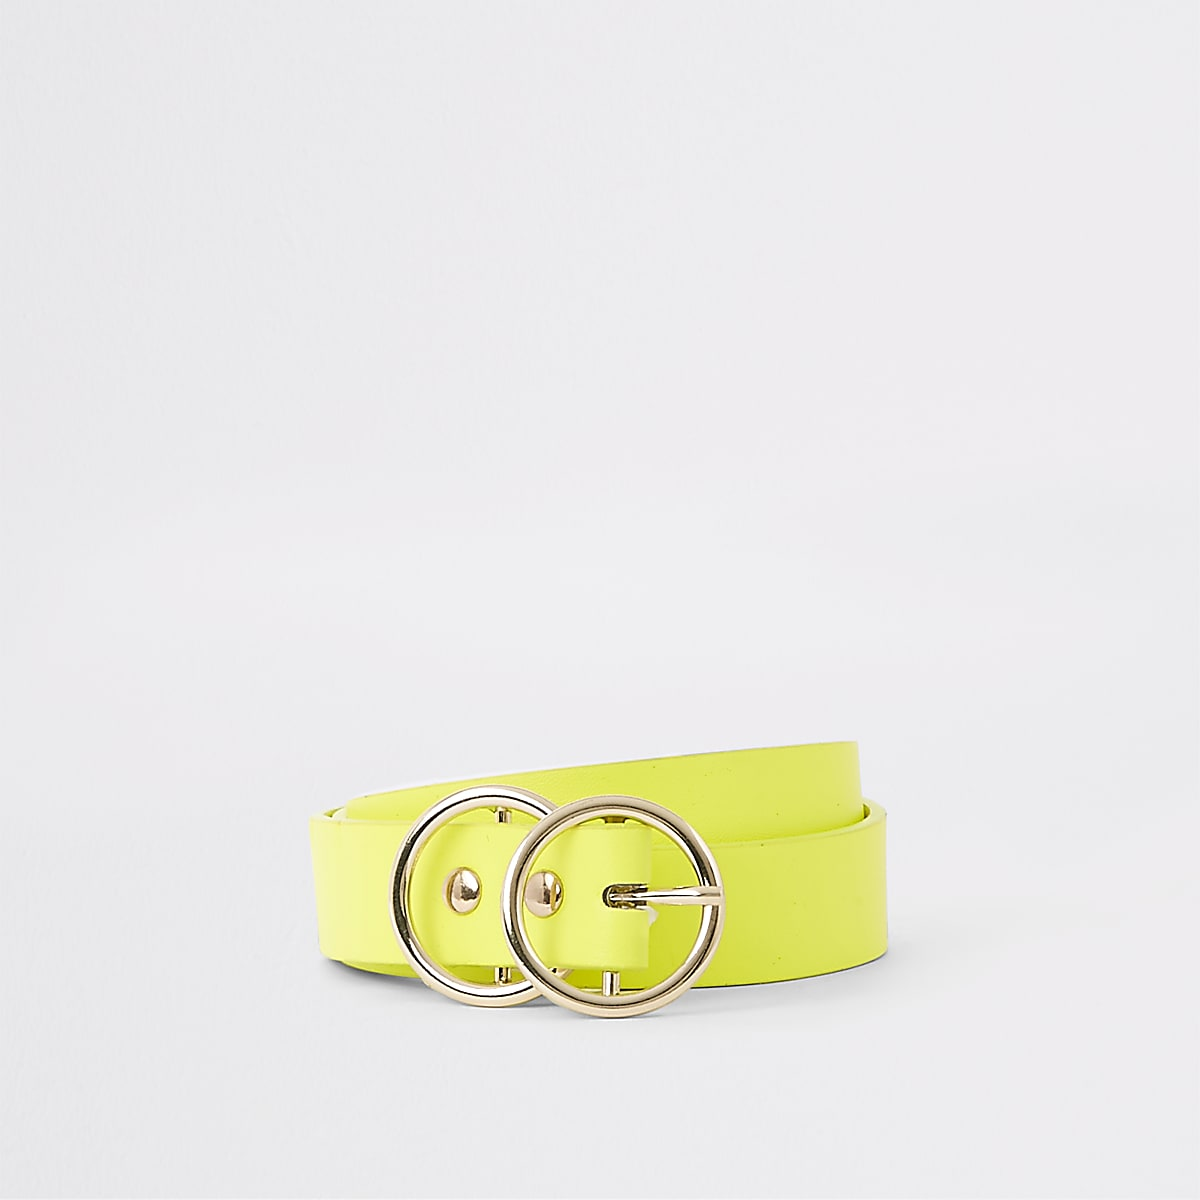 Neon yellow double ring mini jeans belt